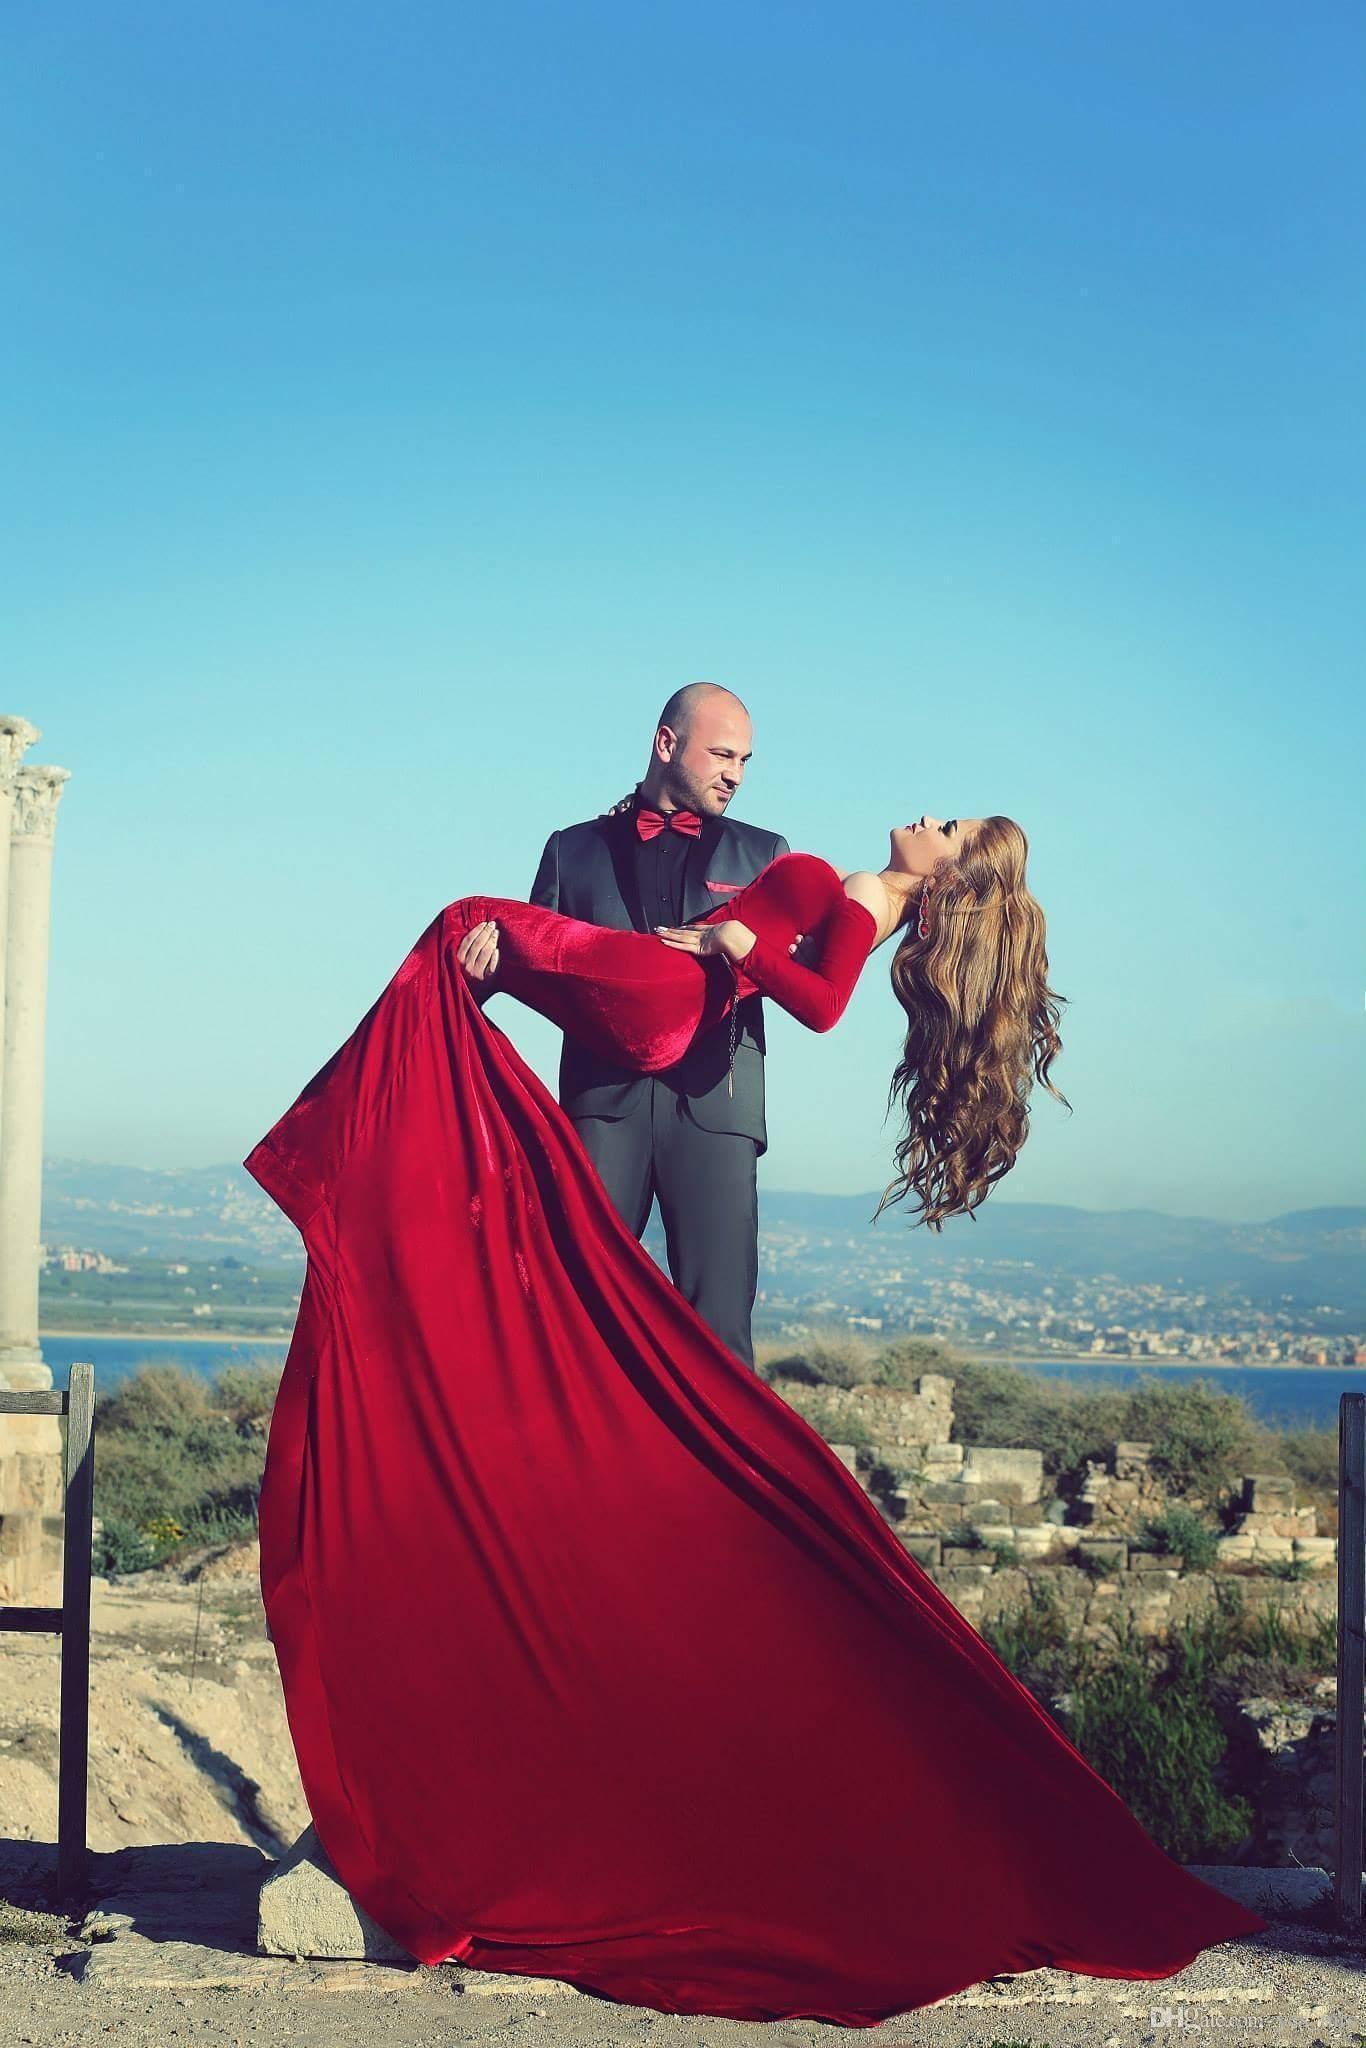 Mhamad 아랍어 회교도 이브닝 드레스 겨울 부르고뉴 오프 어깨 긴 소매 어두운 붉은 인어 벨벳 긴 열차 파티 아랍어 댄스 파티 드레스